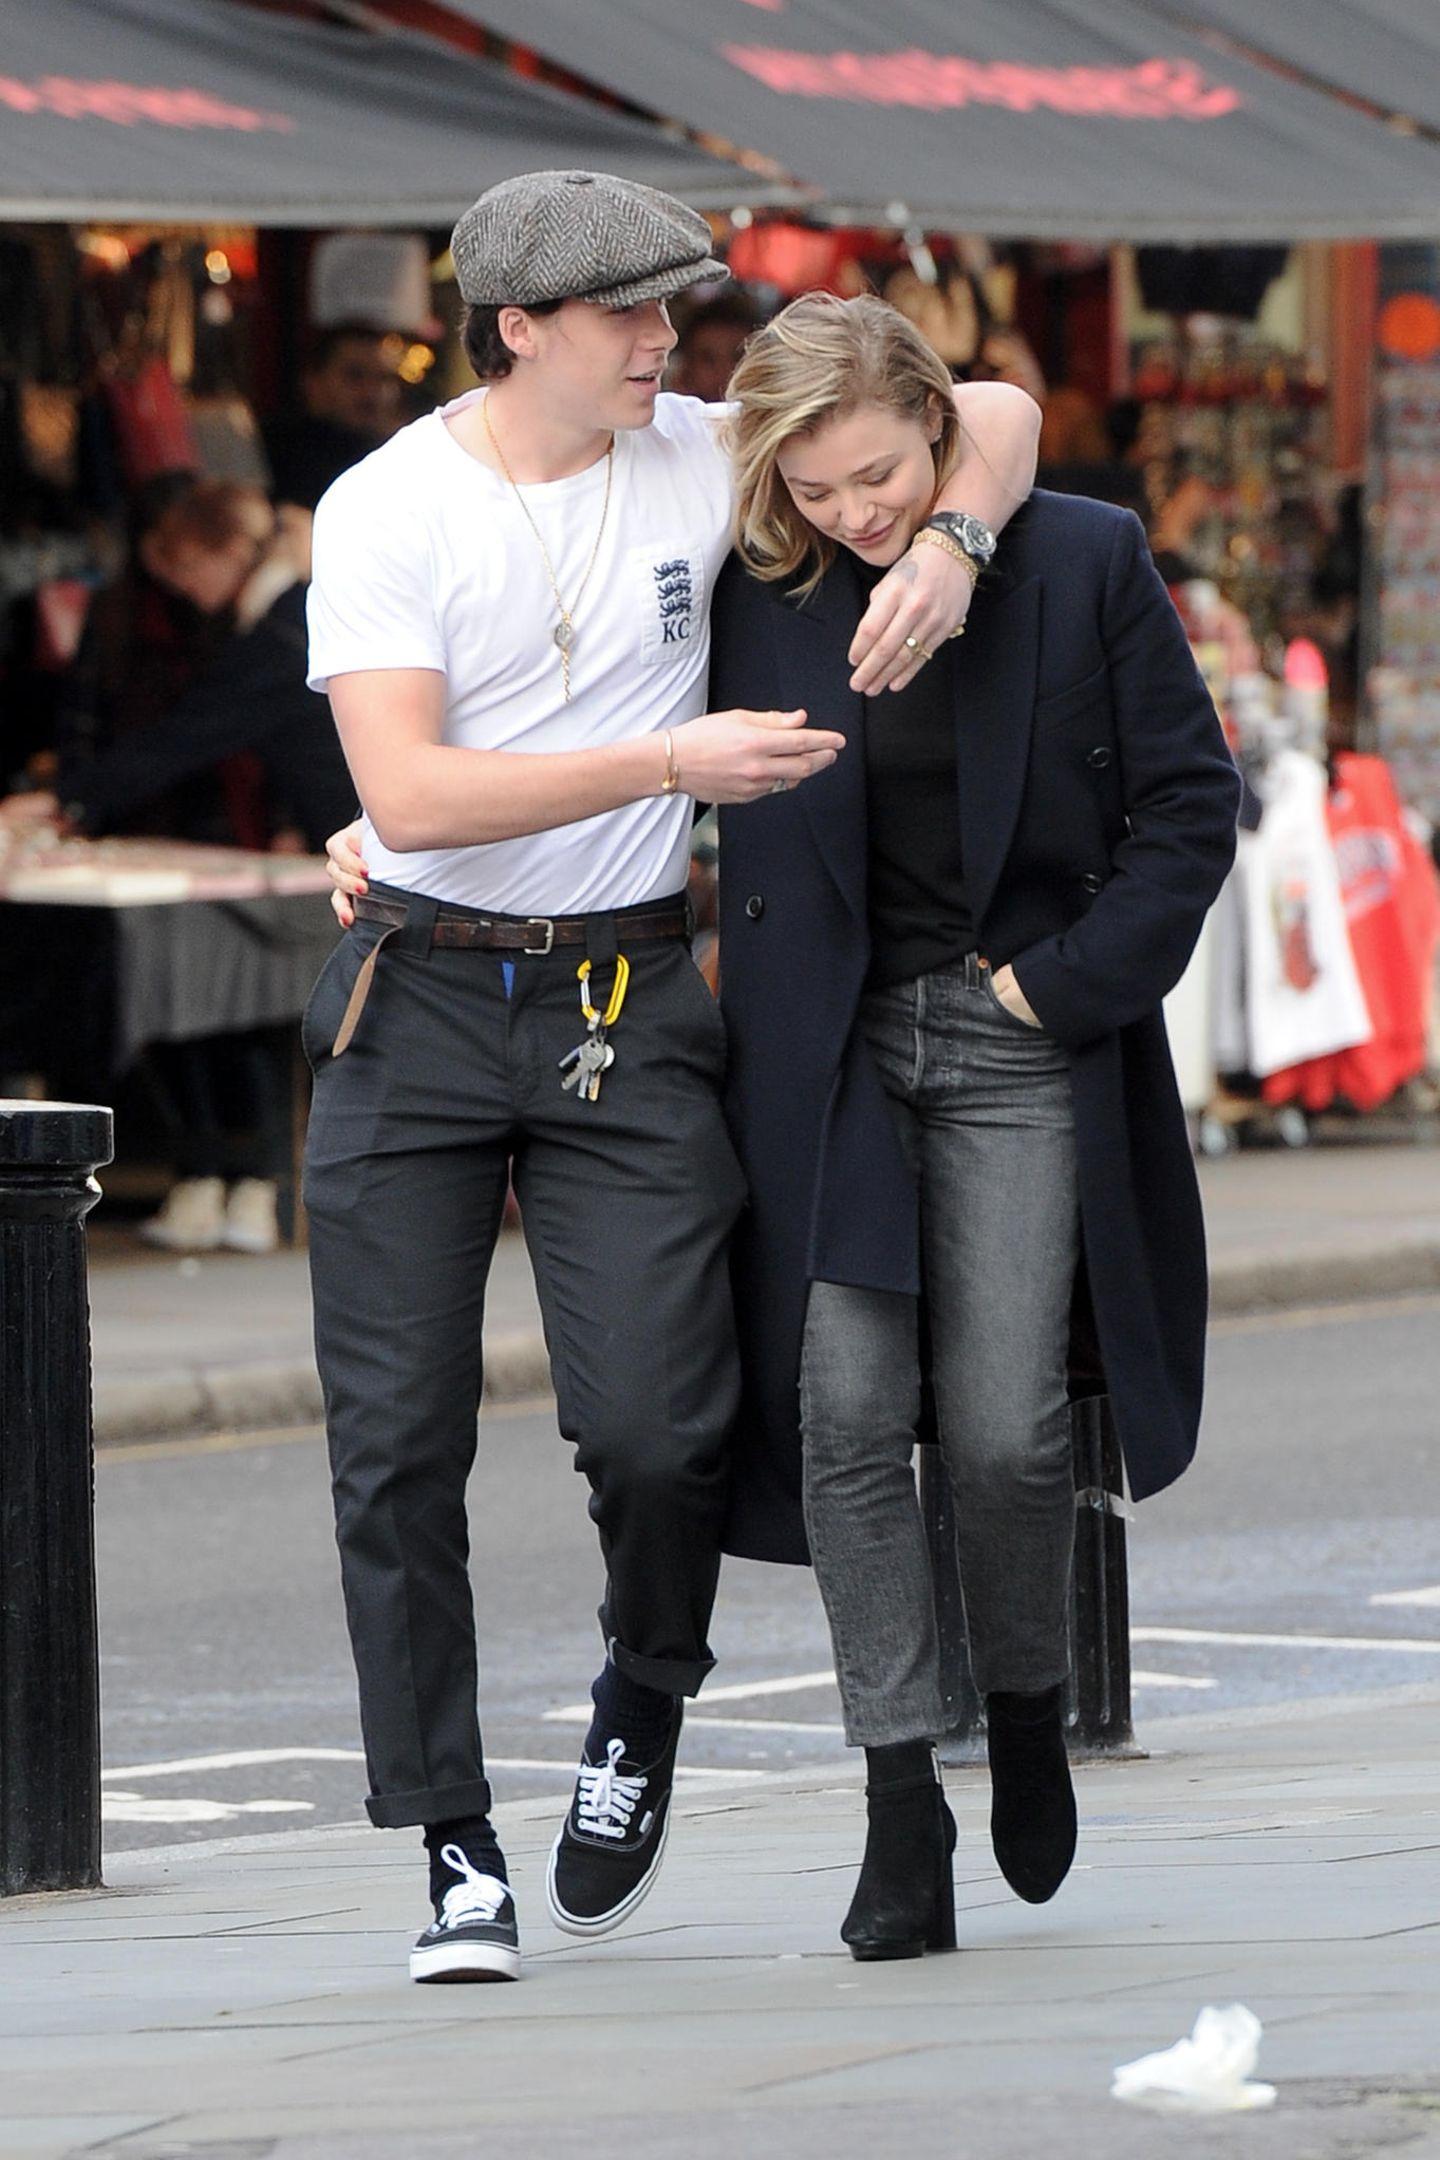 10. Januar 2018  Wie romantisch! Brooklyn Beckham schlendert mit Freundin, der SchauspielerinChloë Grace Moretz verliebt durch Notting Hill in London.